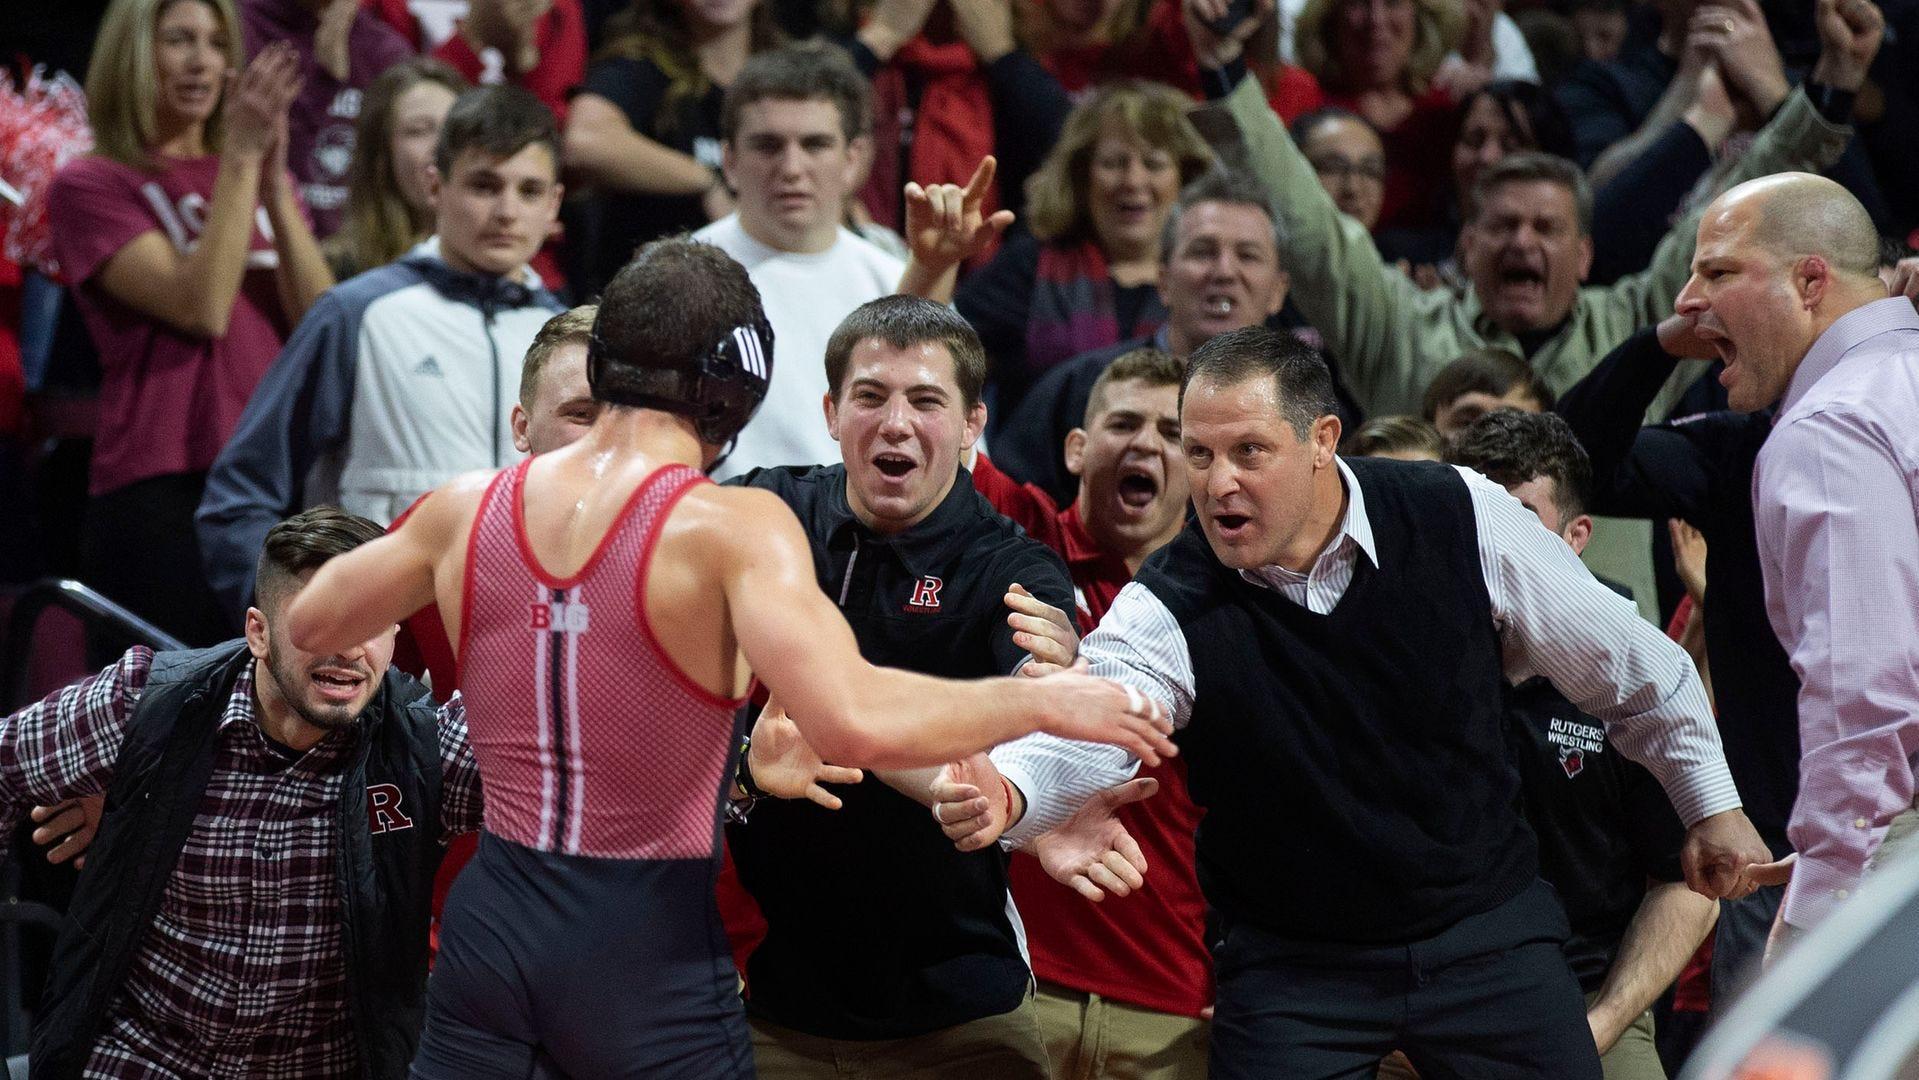 College Wrestling: Anthony Ashnault, Nick Suriano capture Big Ten  championships